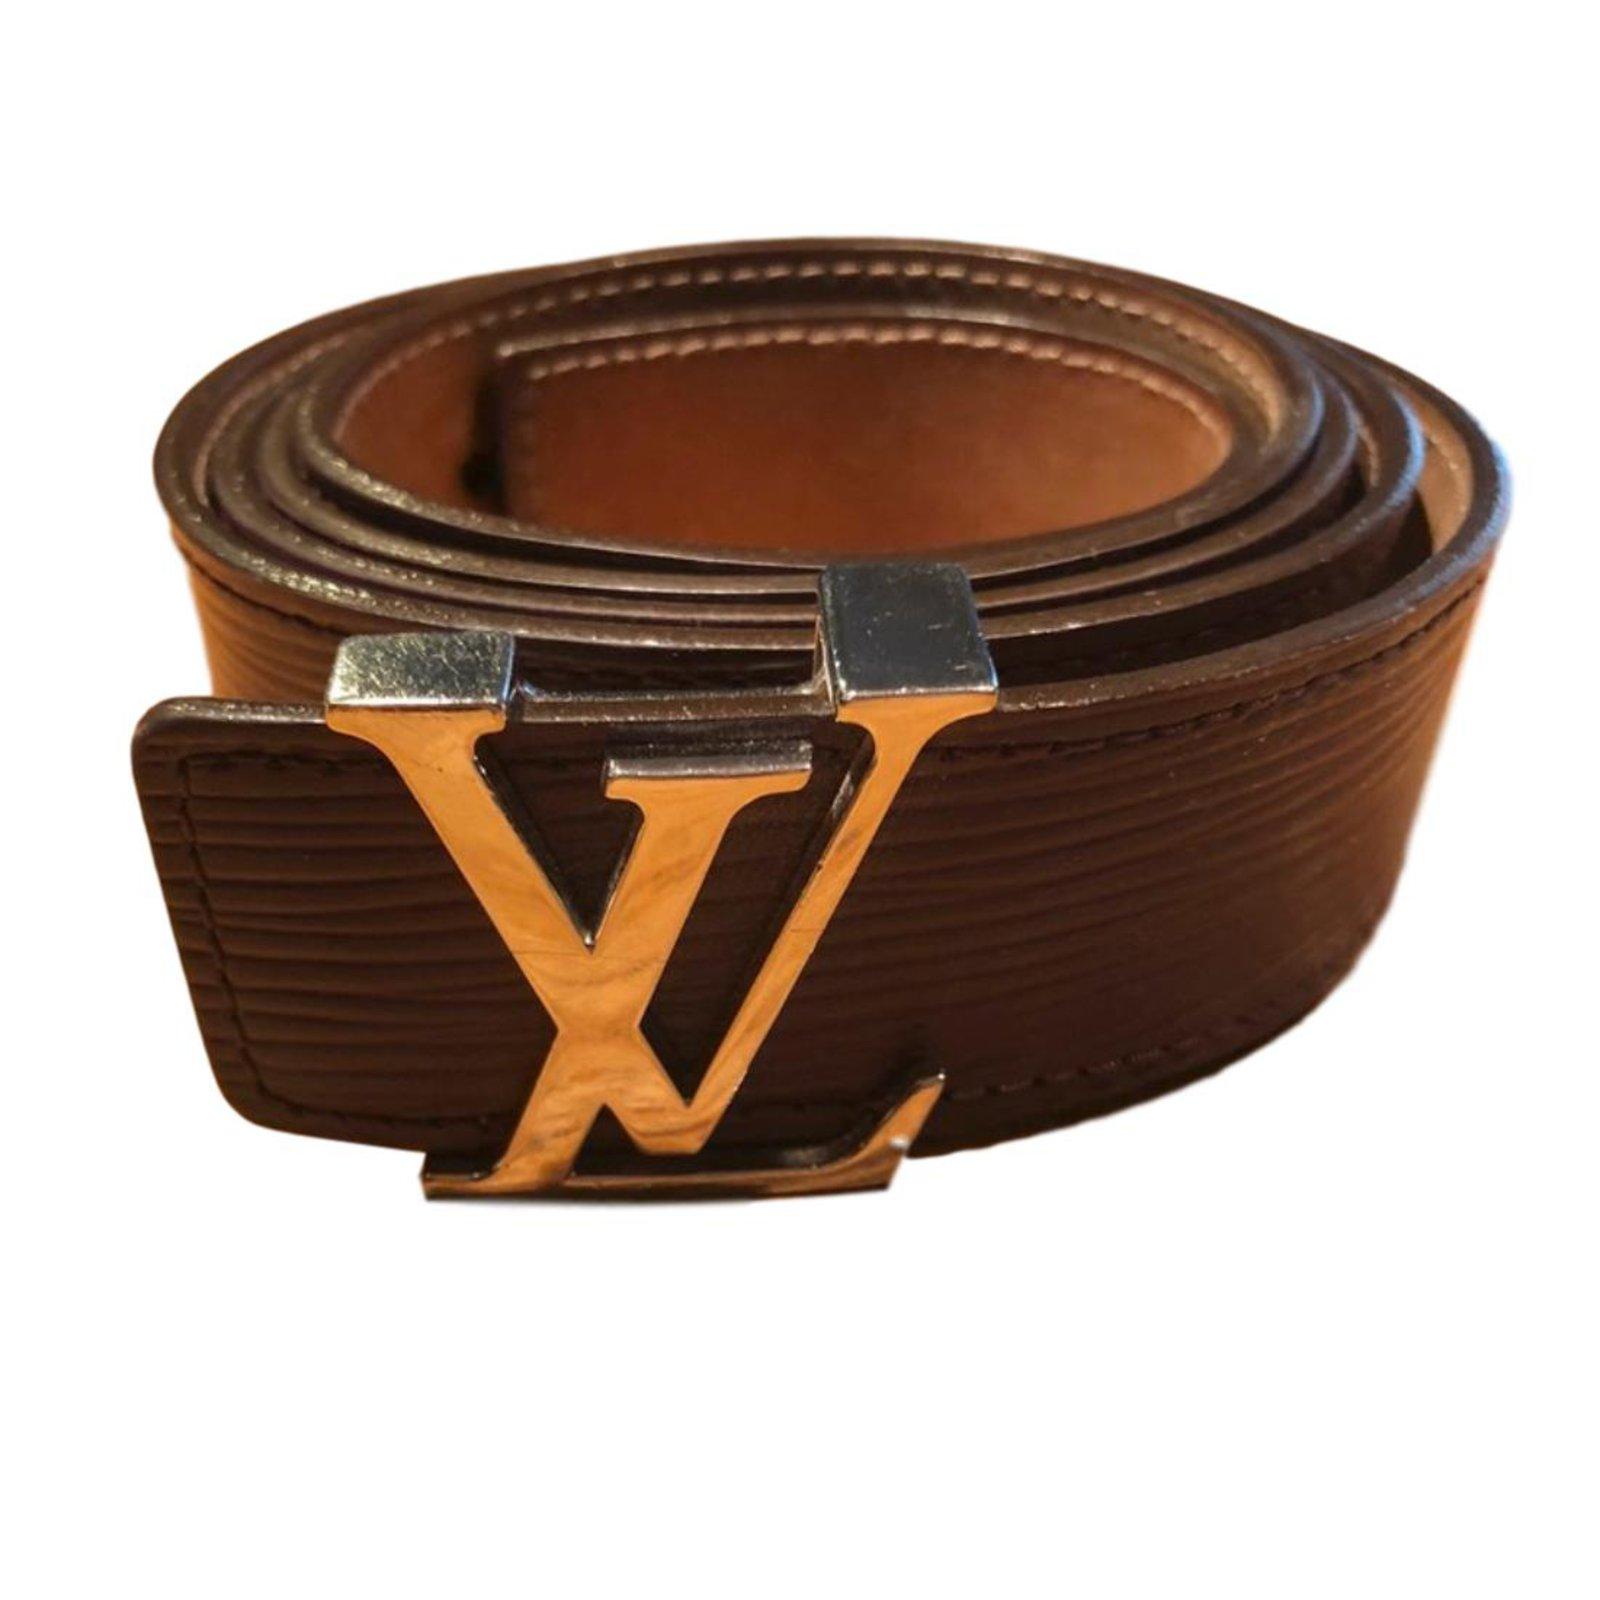 02b07c1e8cf6 Louis Vuitton Belts Belts Leather Purple ref.62792 - Joli Closet